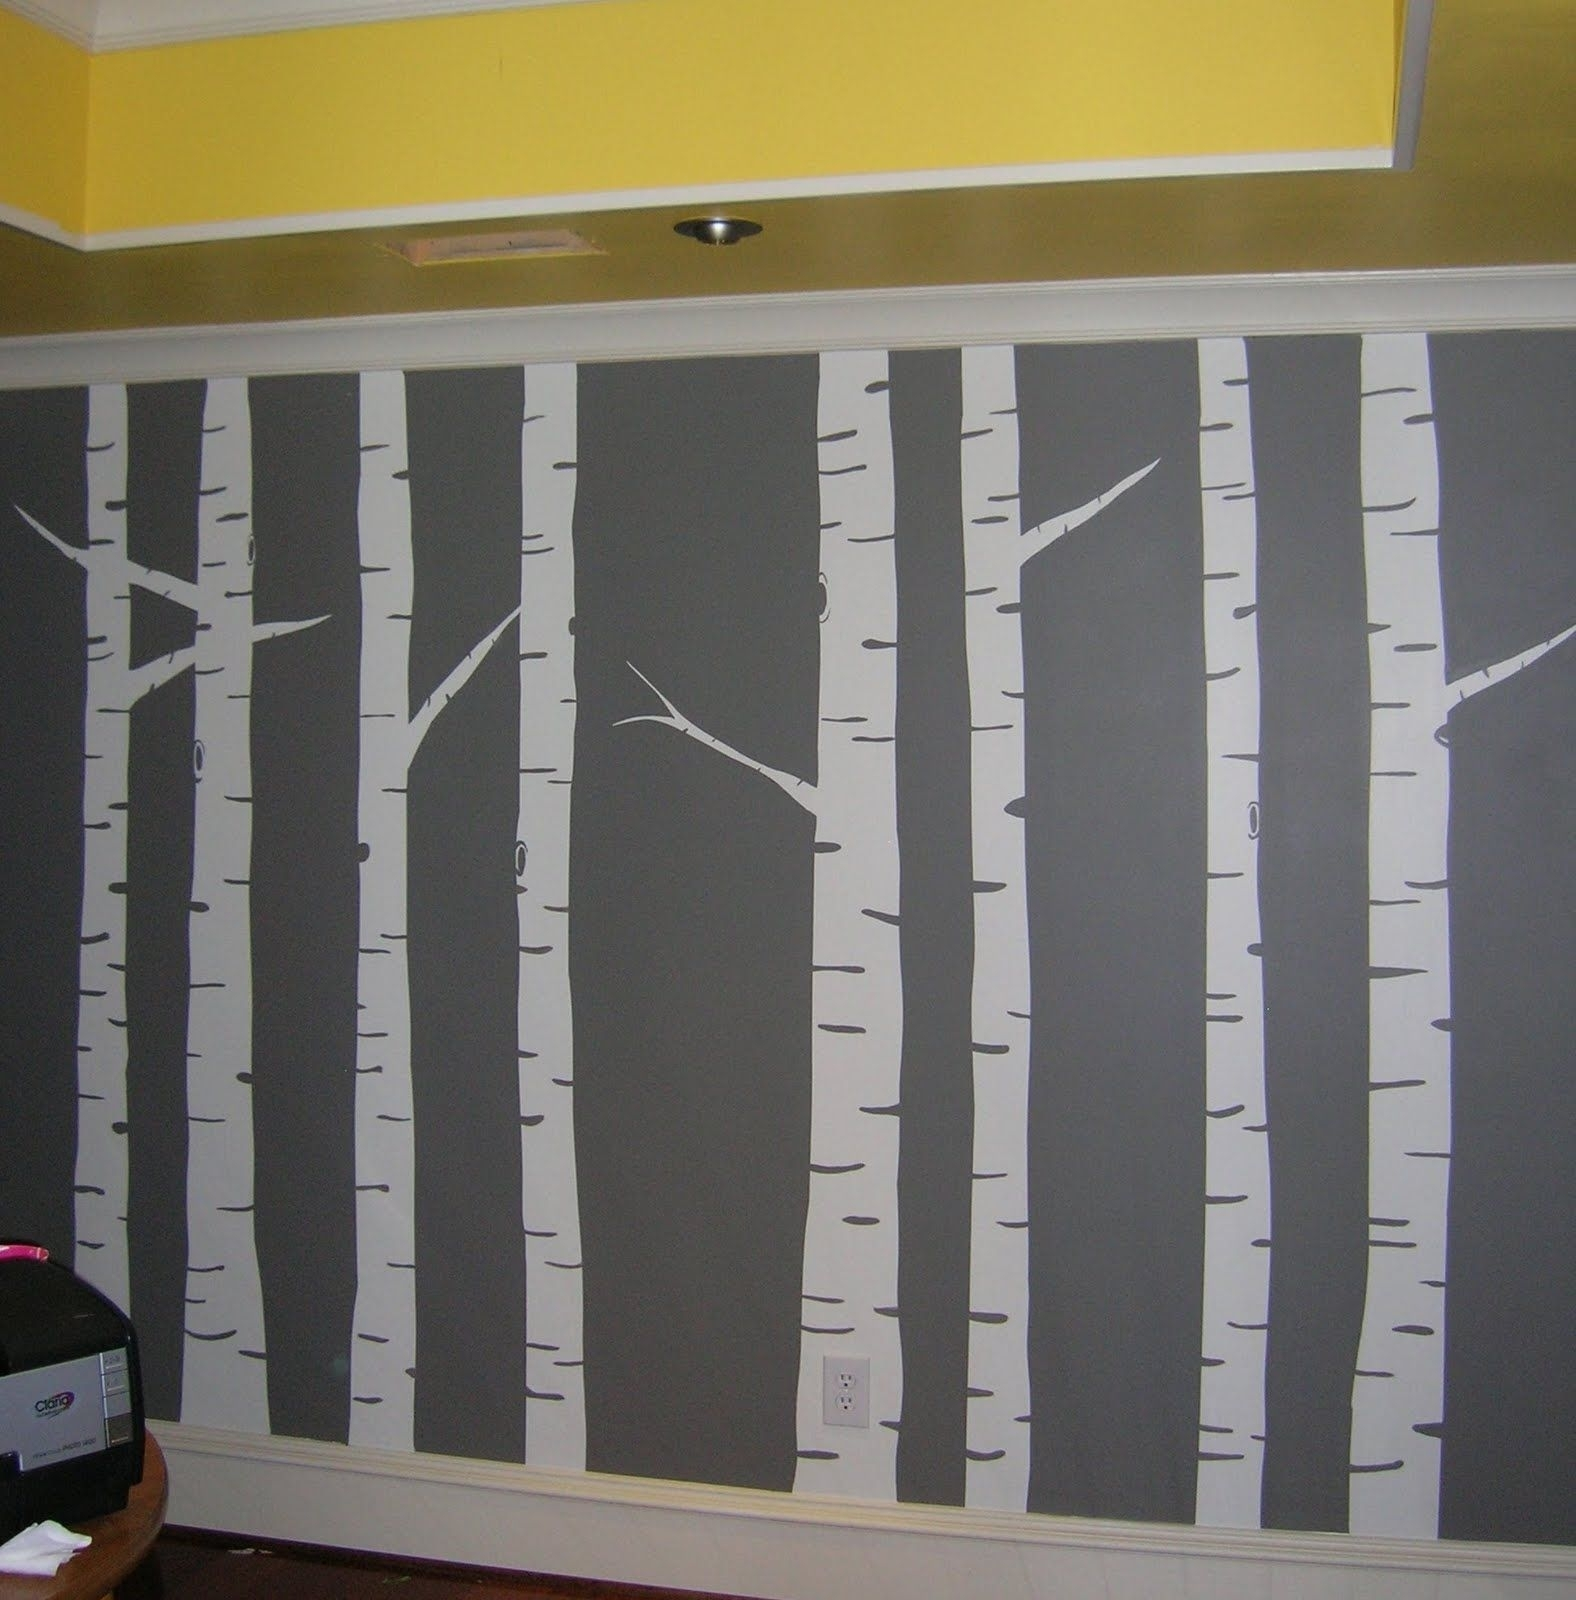 Diy Wall Mural | Diy Wall Painted Birch Tree Wall Art Mural Gray Regarding Current Birch Tree Wall Art (View 14 of 20)